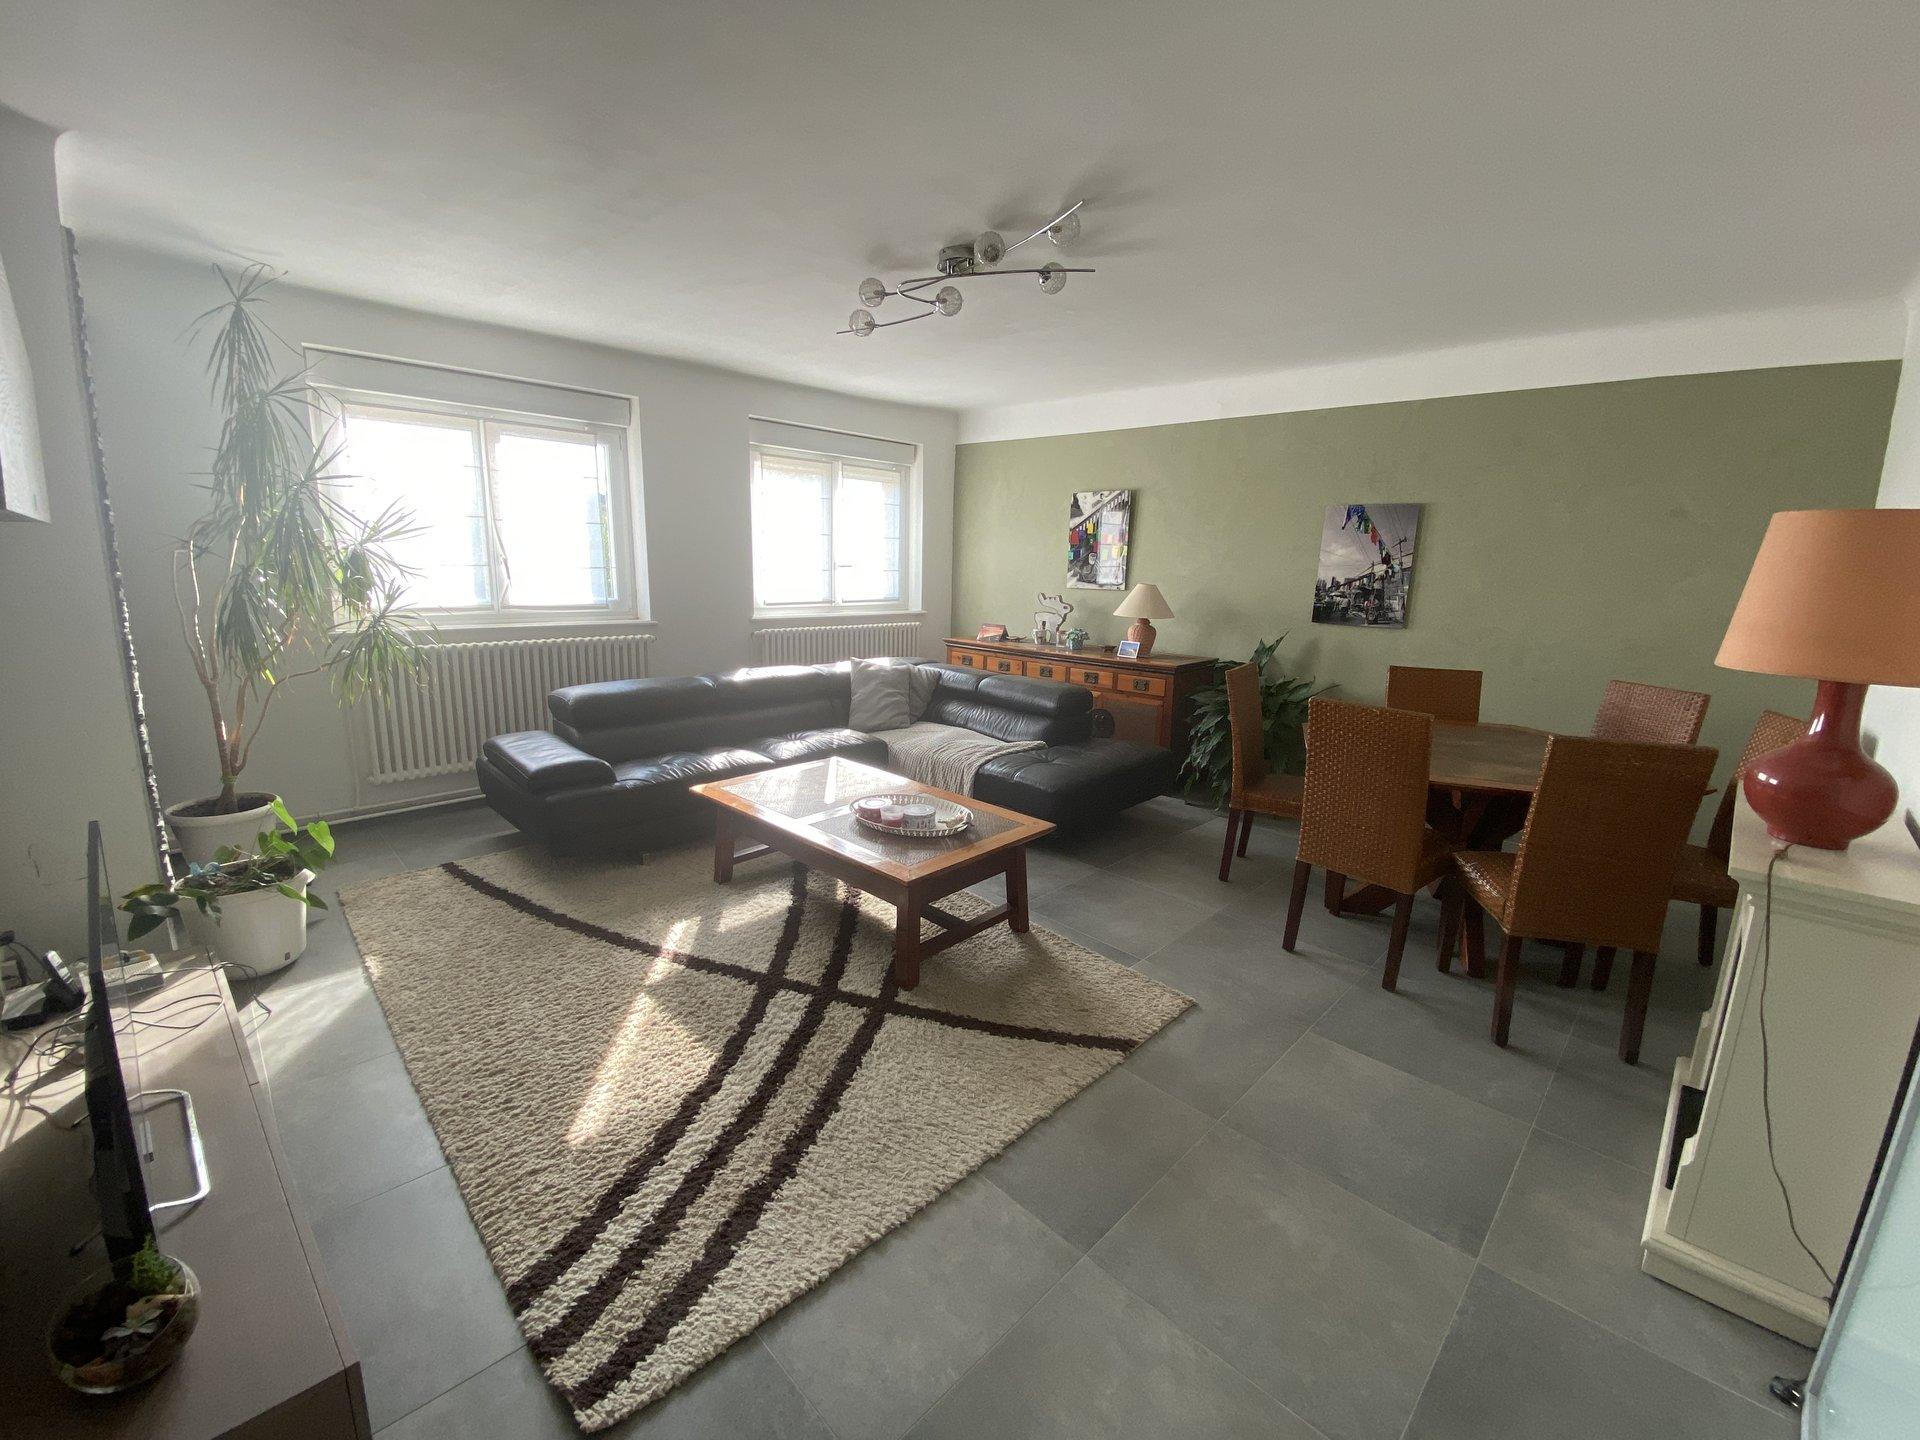 Superbe Appartement 2-3 chambres Thionville-Elange